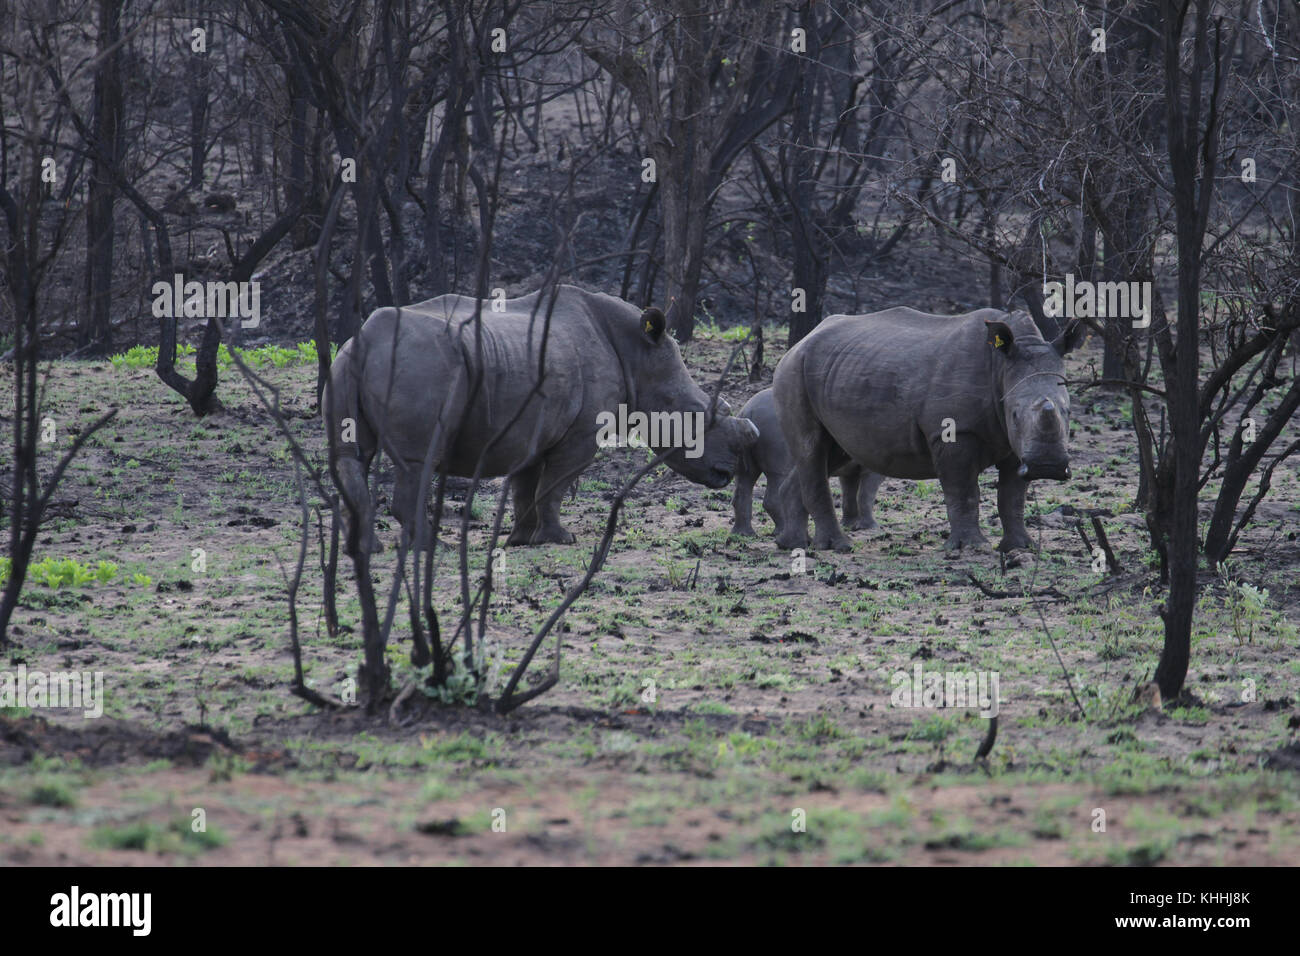 Matobo Park, Zimbabwe - 17 October 2011: A white rhino family (Ceratotherium simum cottoni) in the Matobo Park. - Stock Image